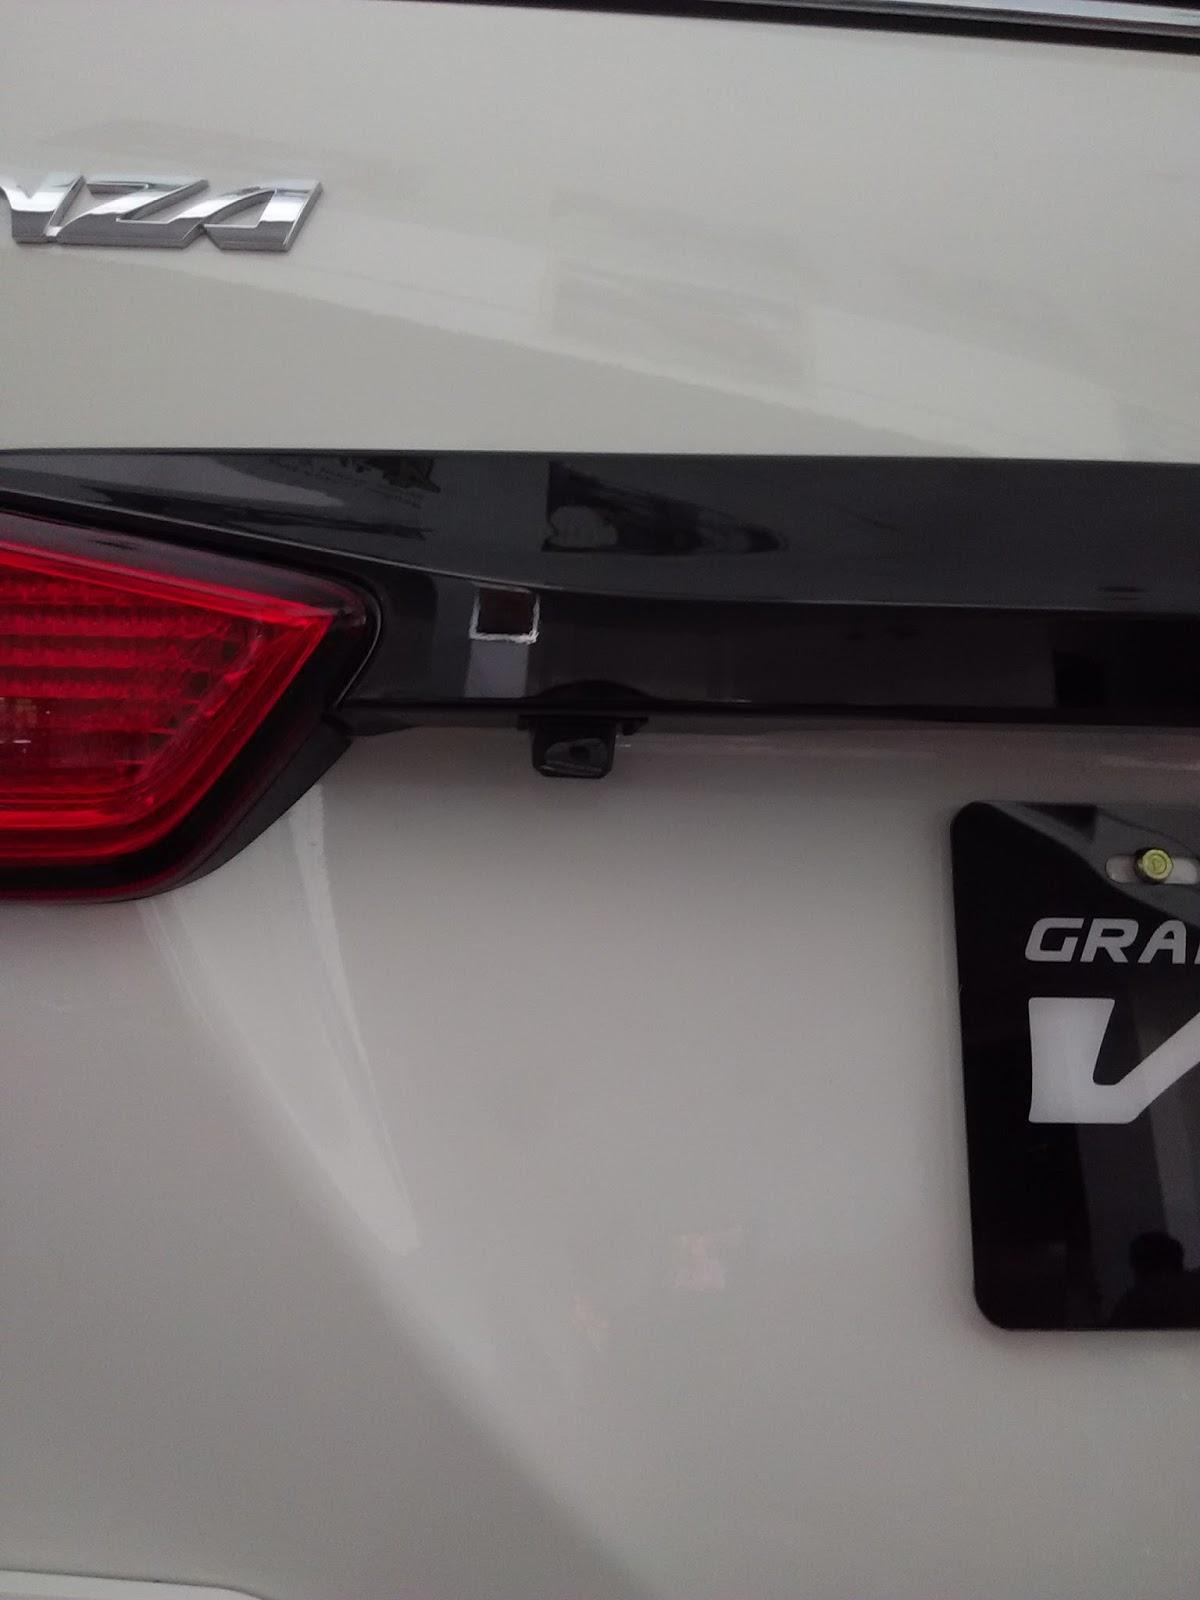 Warna Grand New Veloz 1.5 Pilihan Perbedaan 1 5 Dan 3 Dikta Toyota Satu Lagi Yang Menjadi Pembeda Antara Adalah Adanya Tambahan Rear Parking Camera Untuk Melengkapi Head Unit Monitor Touch Screen